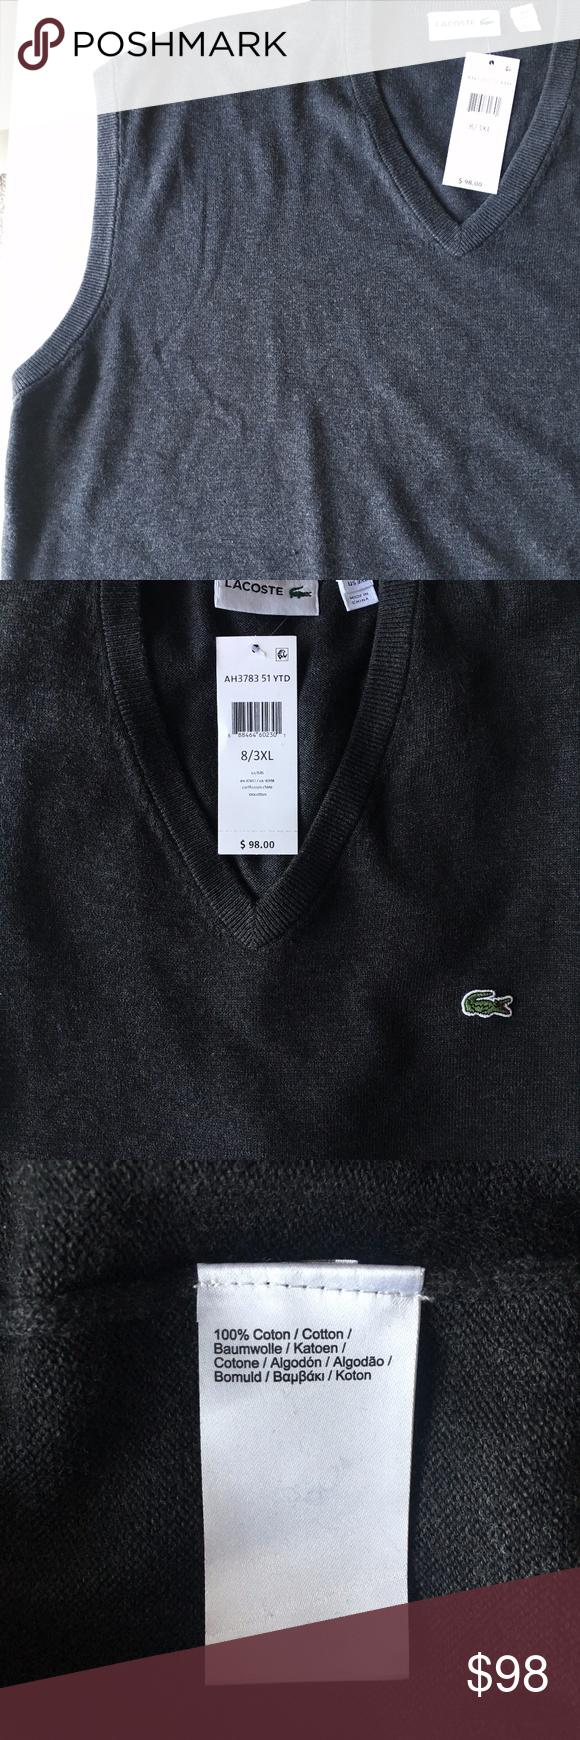 3bd75b65 LACOSTE Men's V-Neck Sleeveless Sweater Vest 3xl LACOSTE Men's V ...